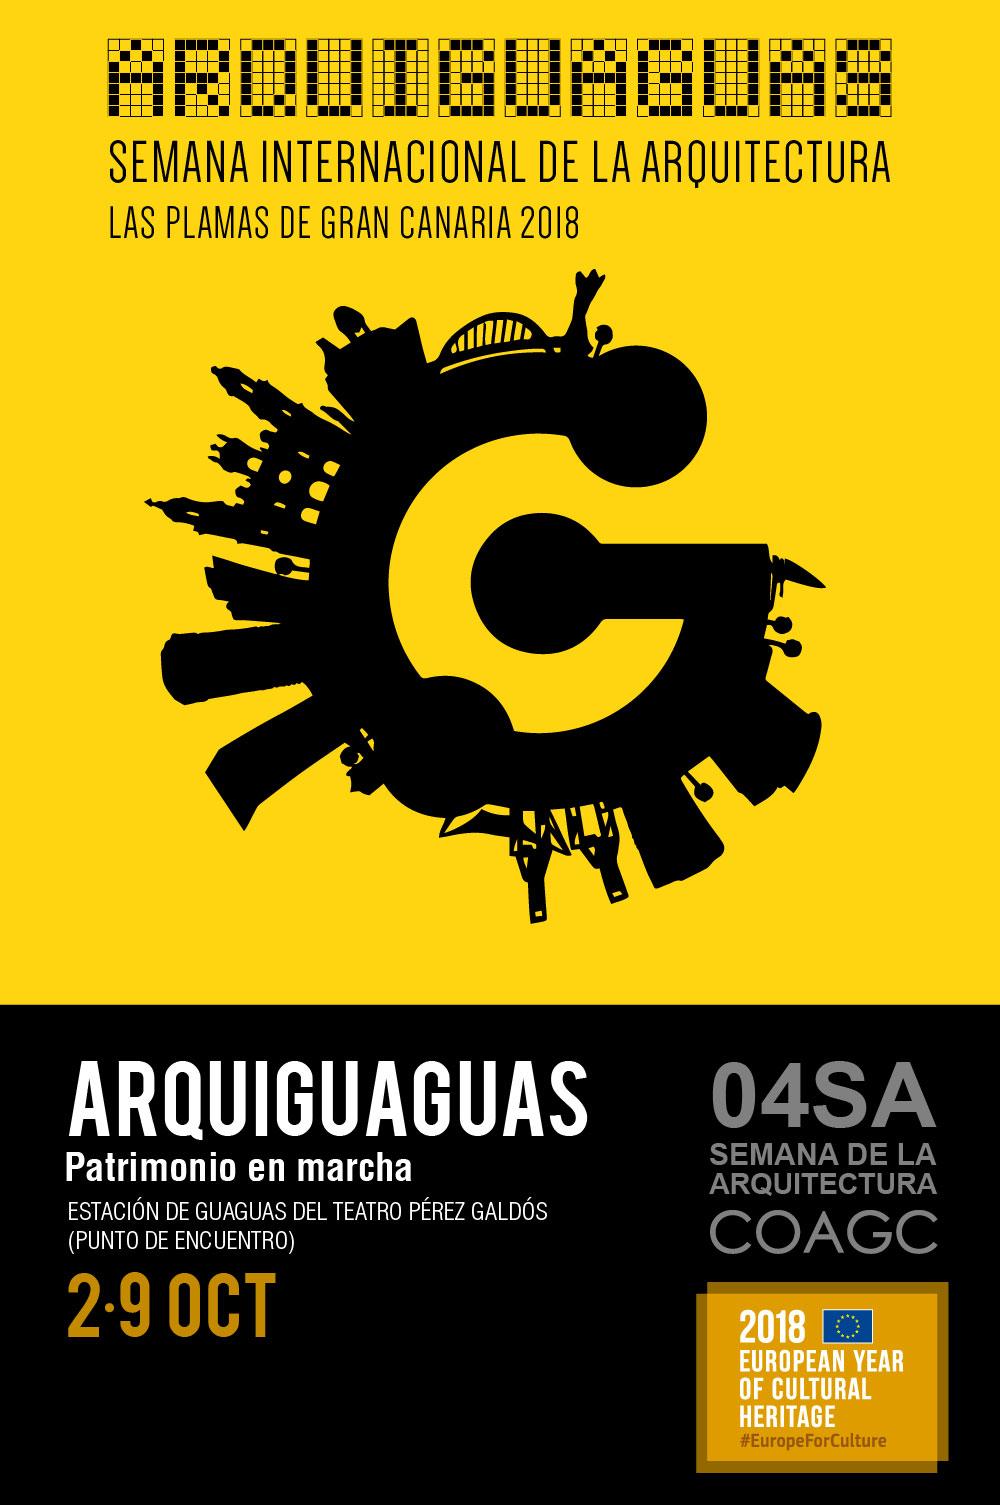 Arquiguaguas. Patrimonio en marcha